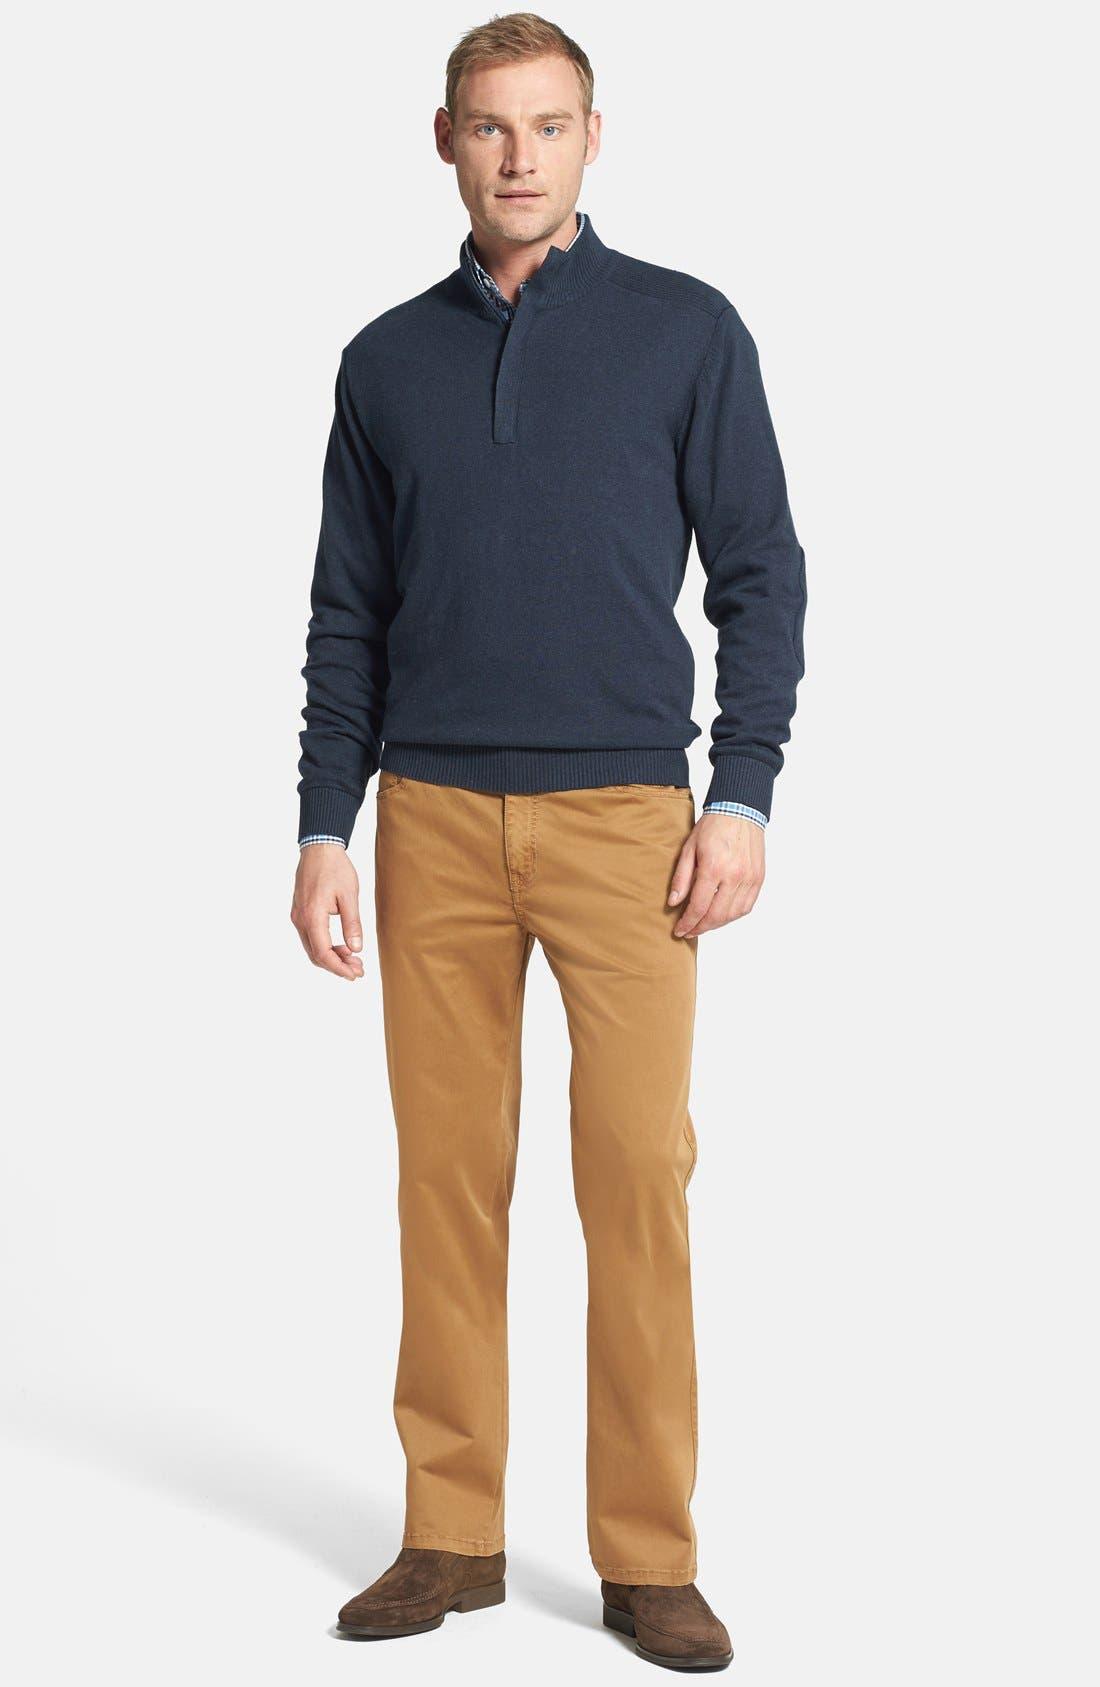 CUTTER & BUCK,                             Broadview Half Zip Sweater,                             Alternate thumbnail 6, color,                             480